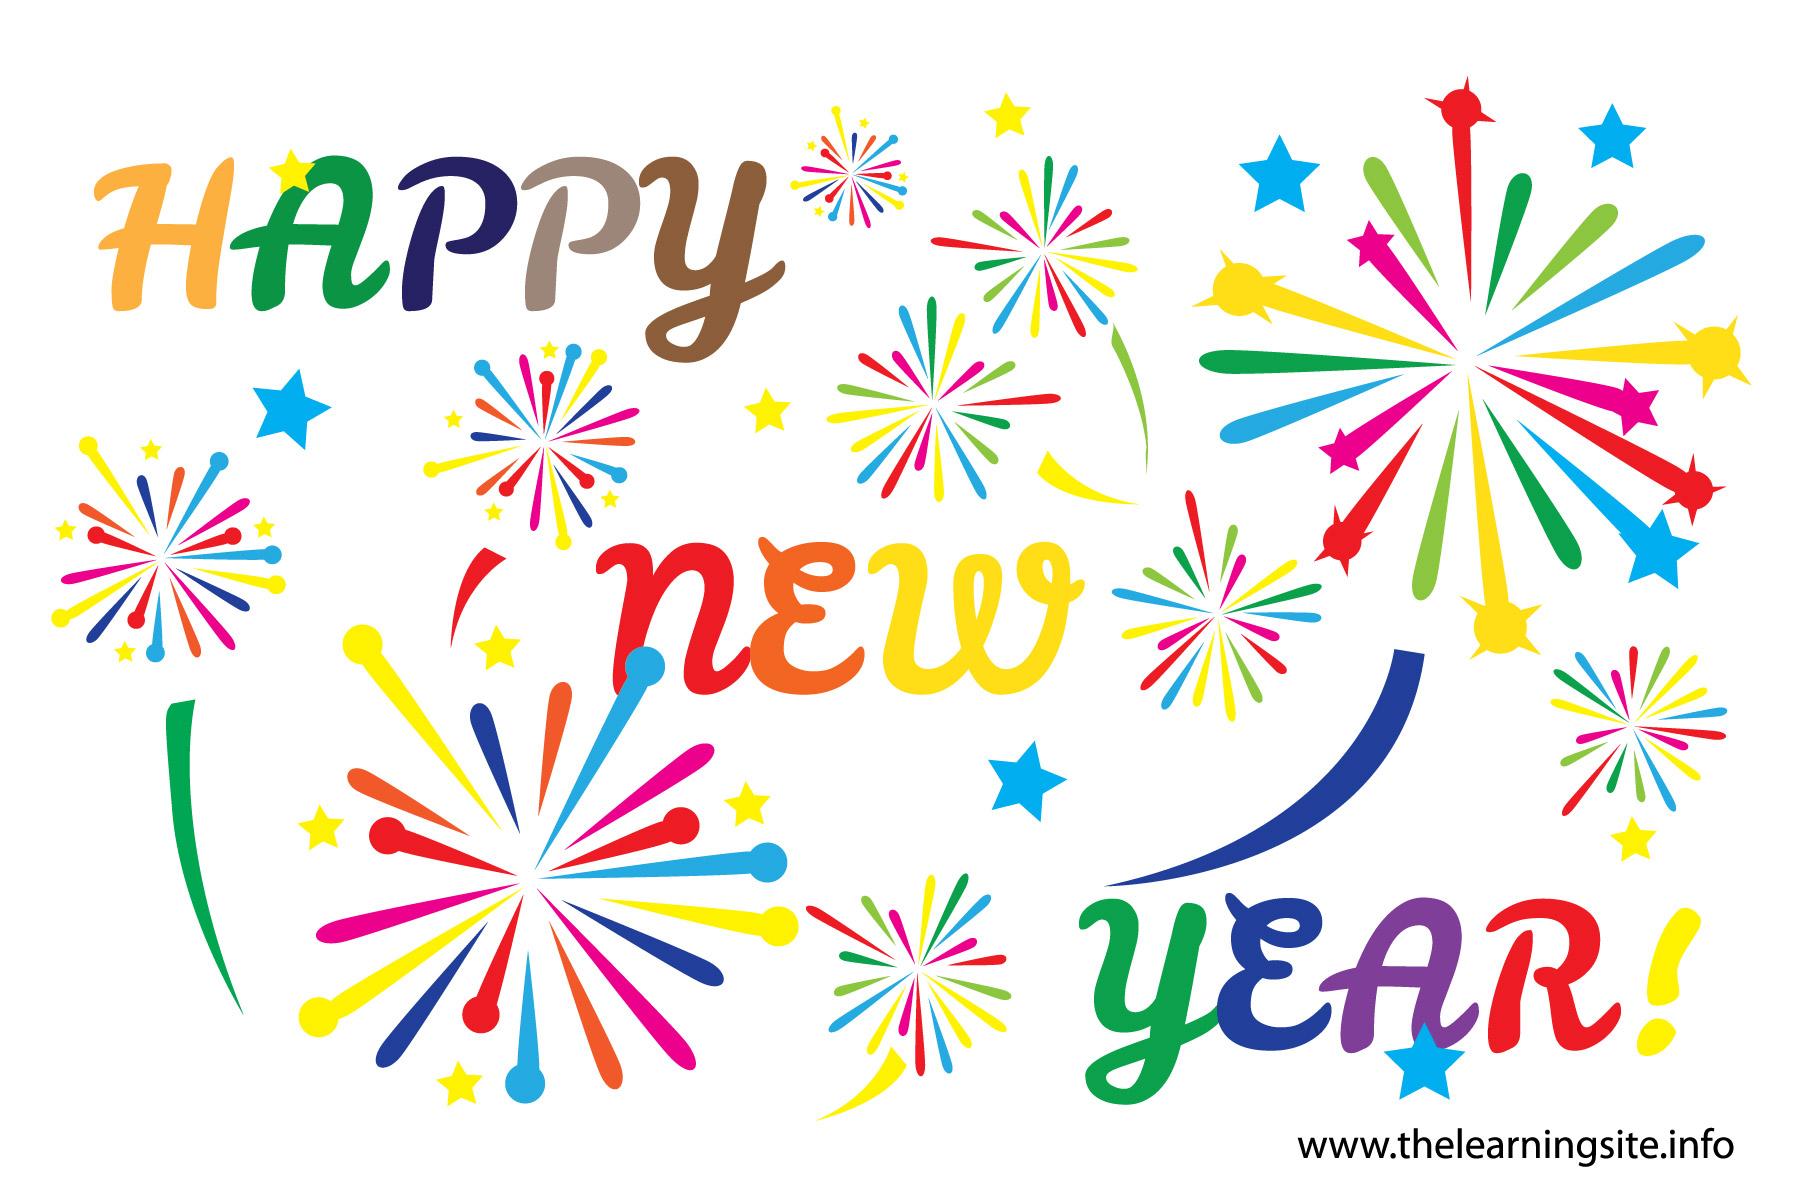 Happy New Year Clipart - .-Happy New Year Clipart - .-10